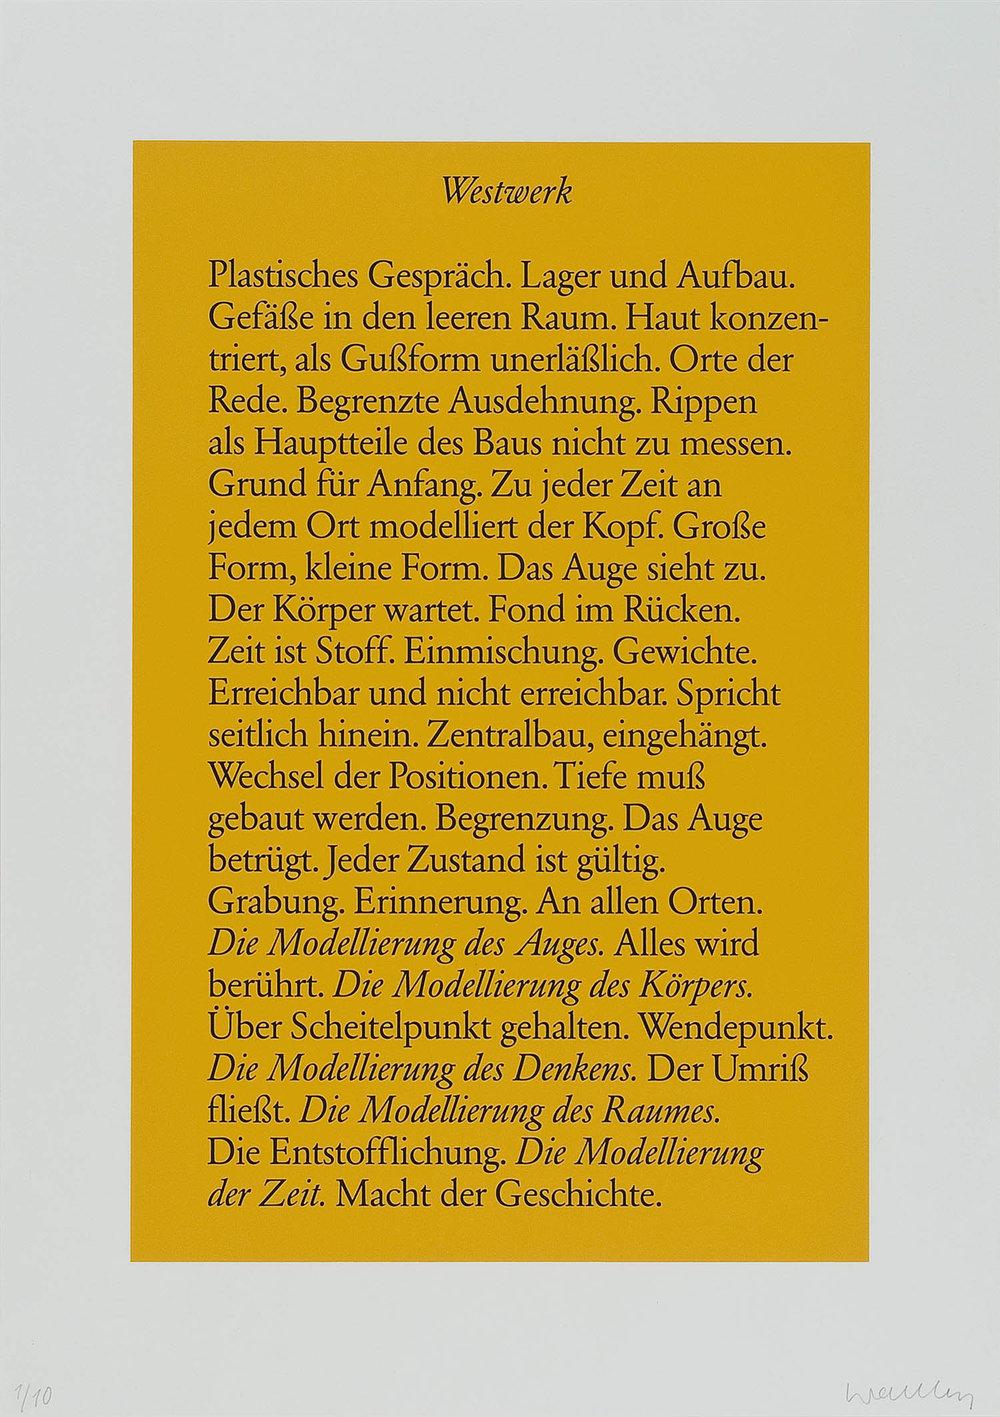 o.T. (Westwerk) | 1986 | Lithographie | 60 x 42 cm